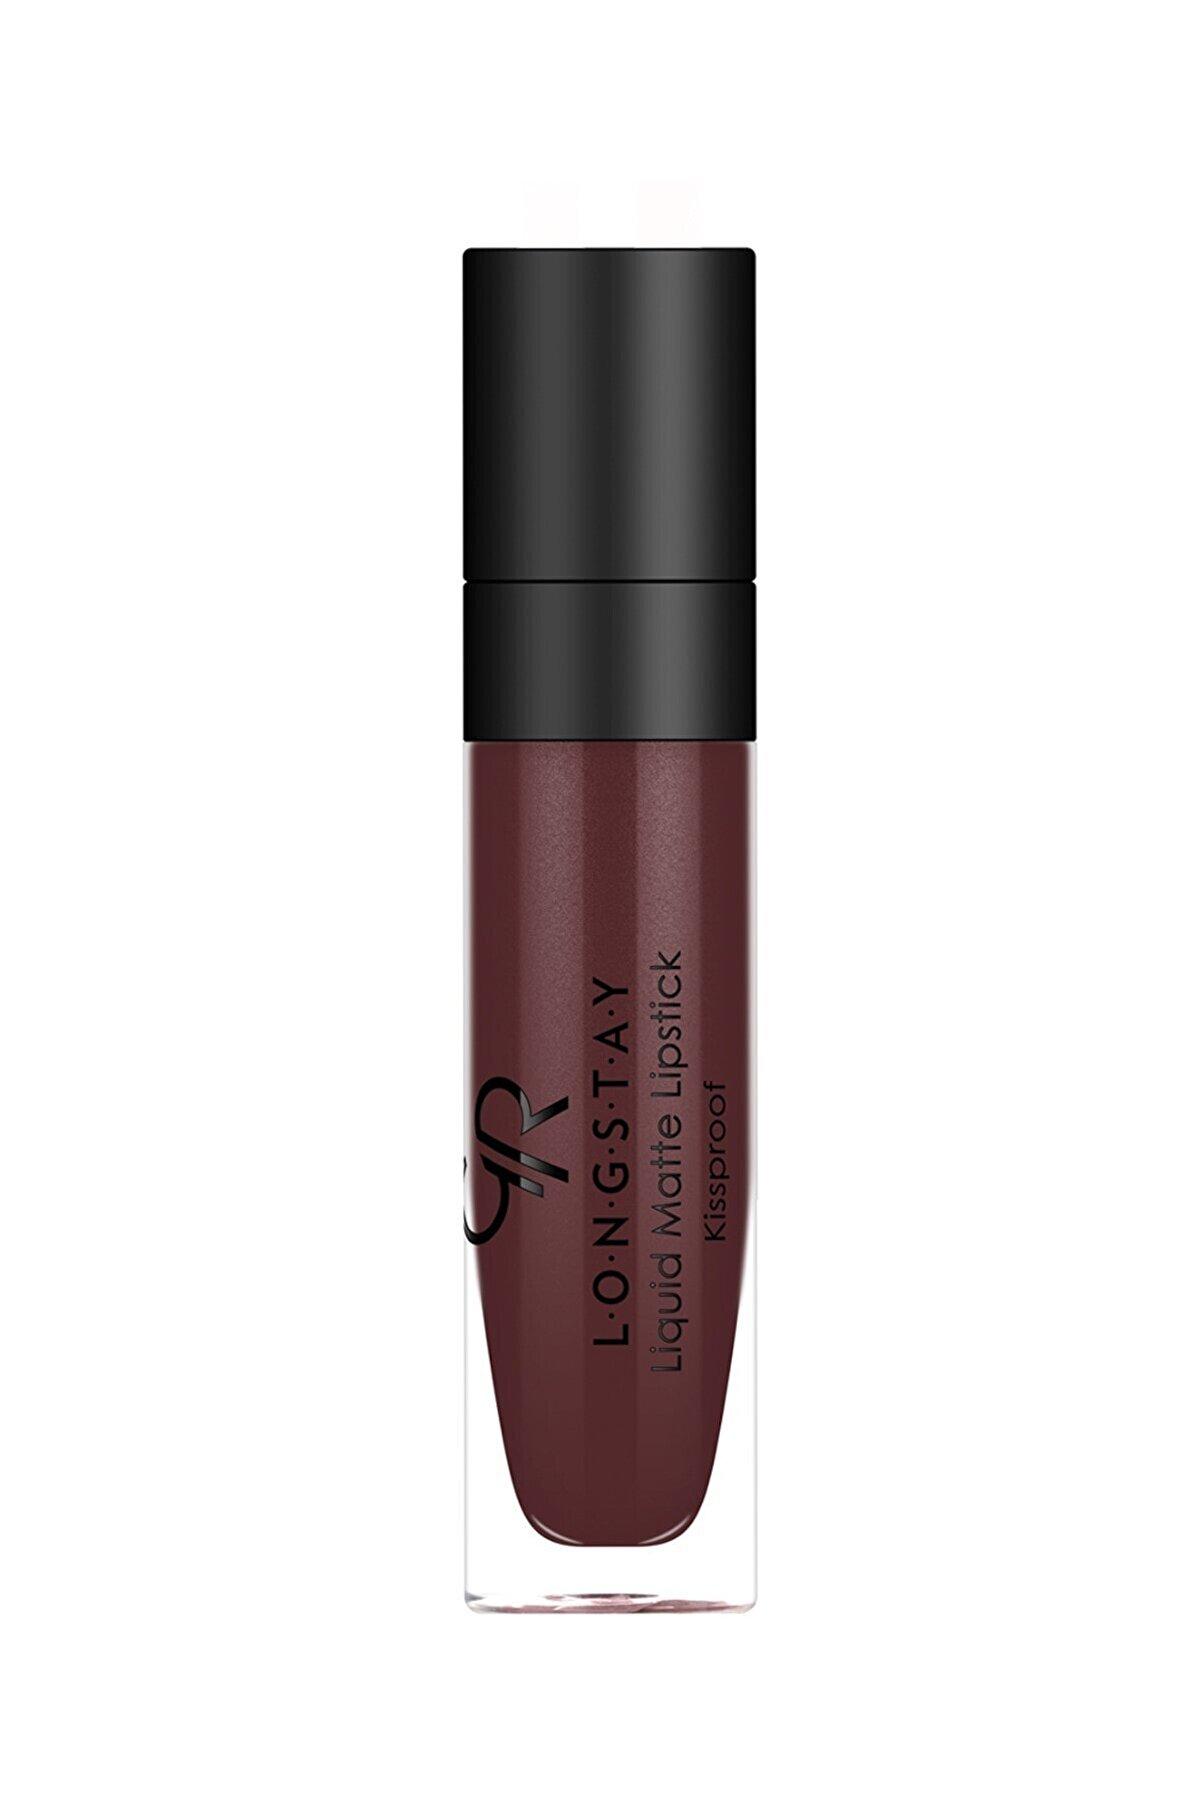 Golden Rose Uzun Süre Kalıcı Likit Mat Ruj - Longstay Liquid Matte Lipstick No: 12 8691190856120